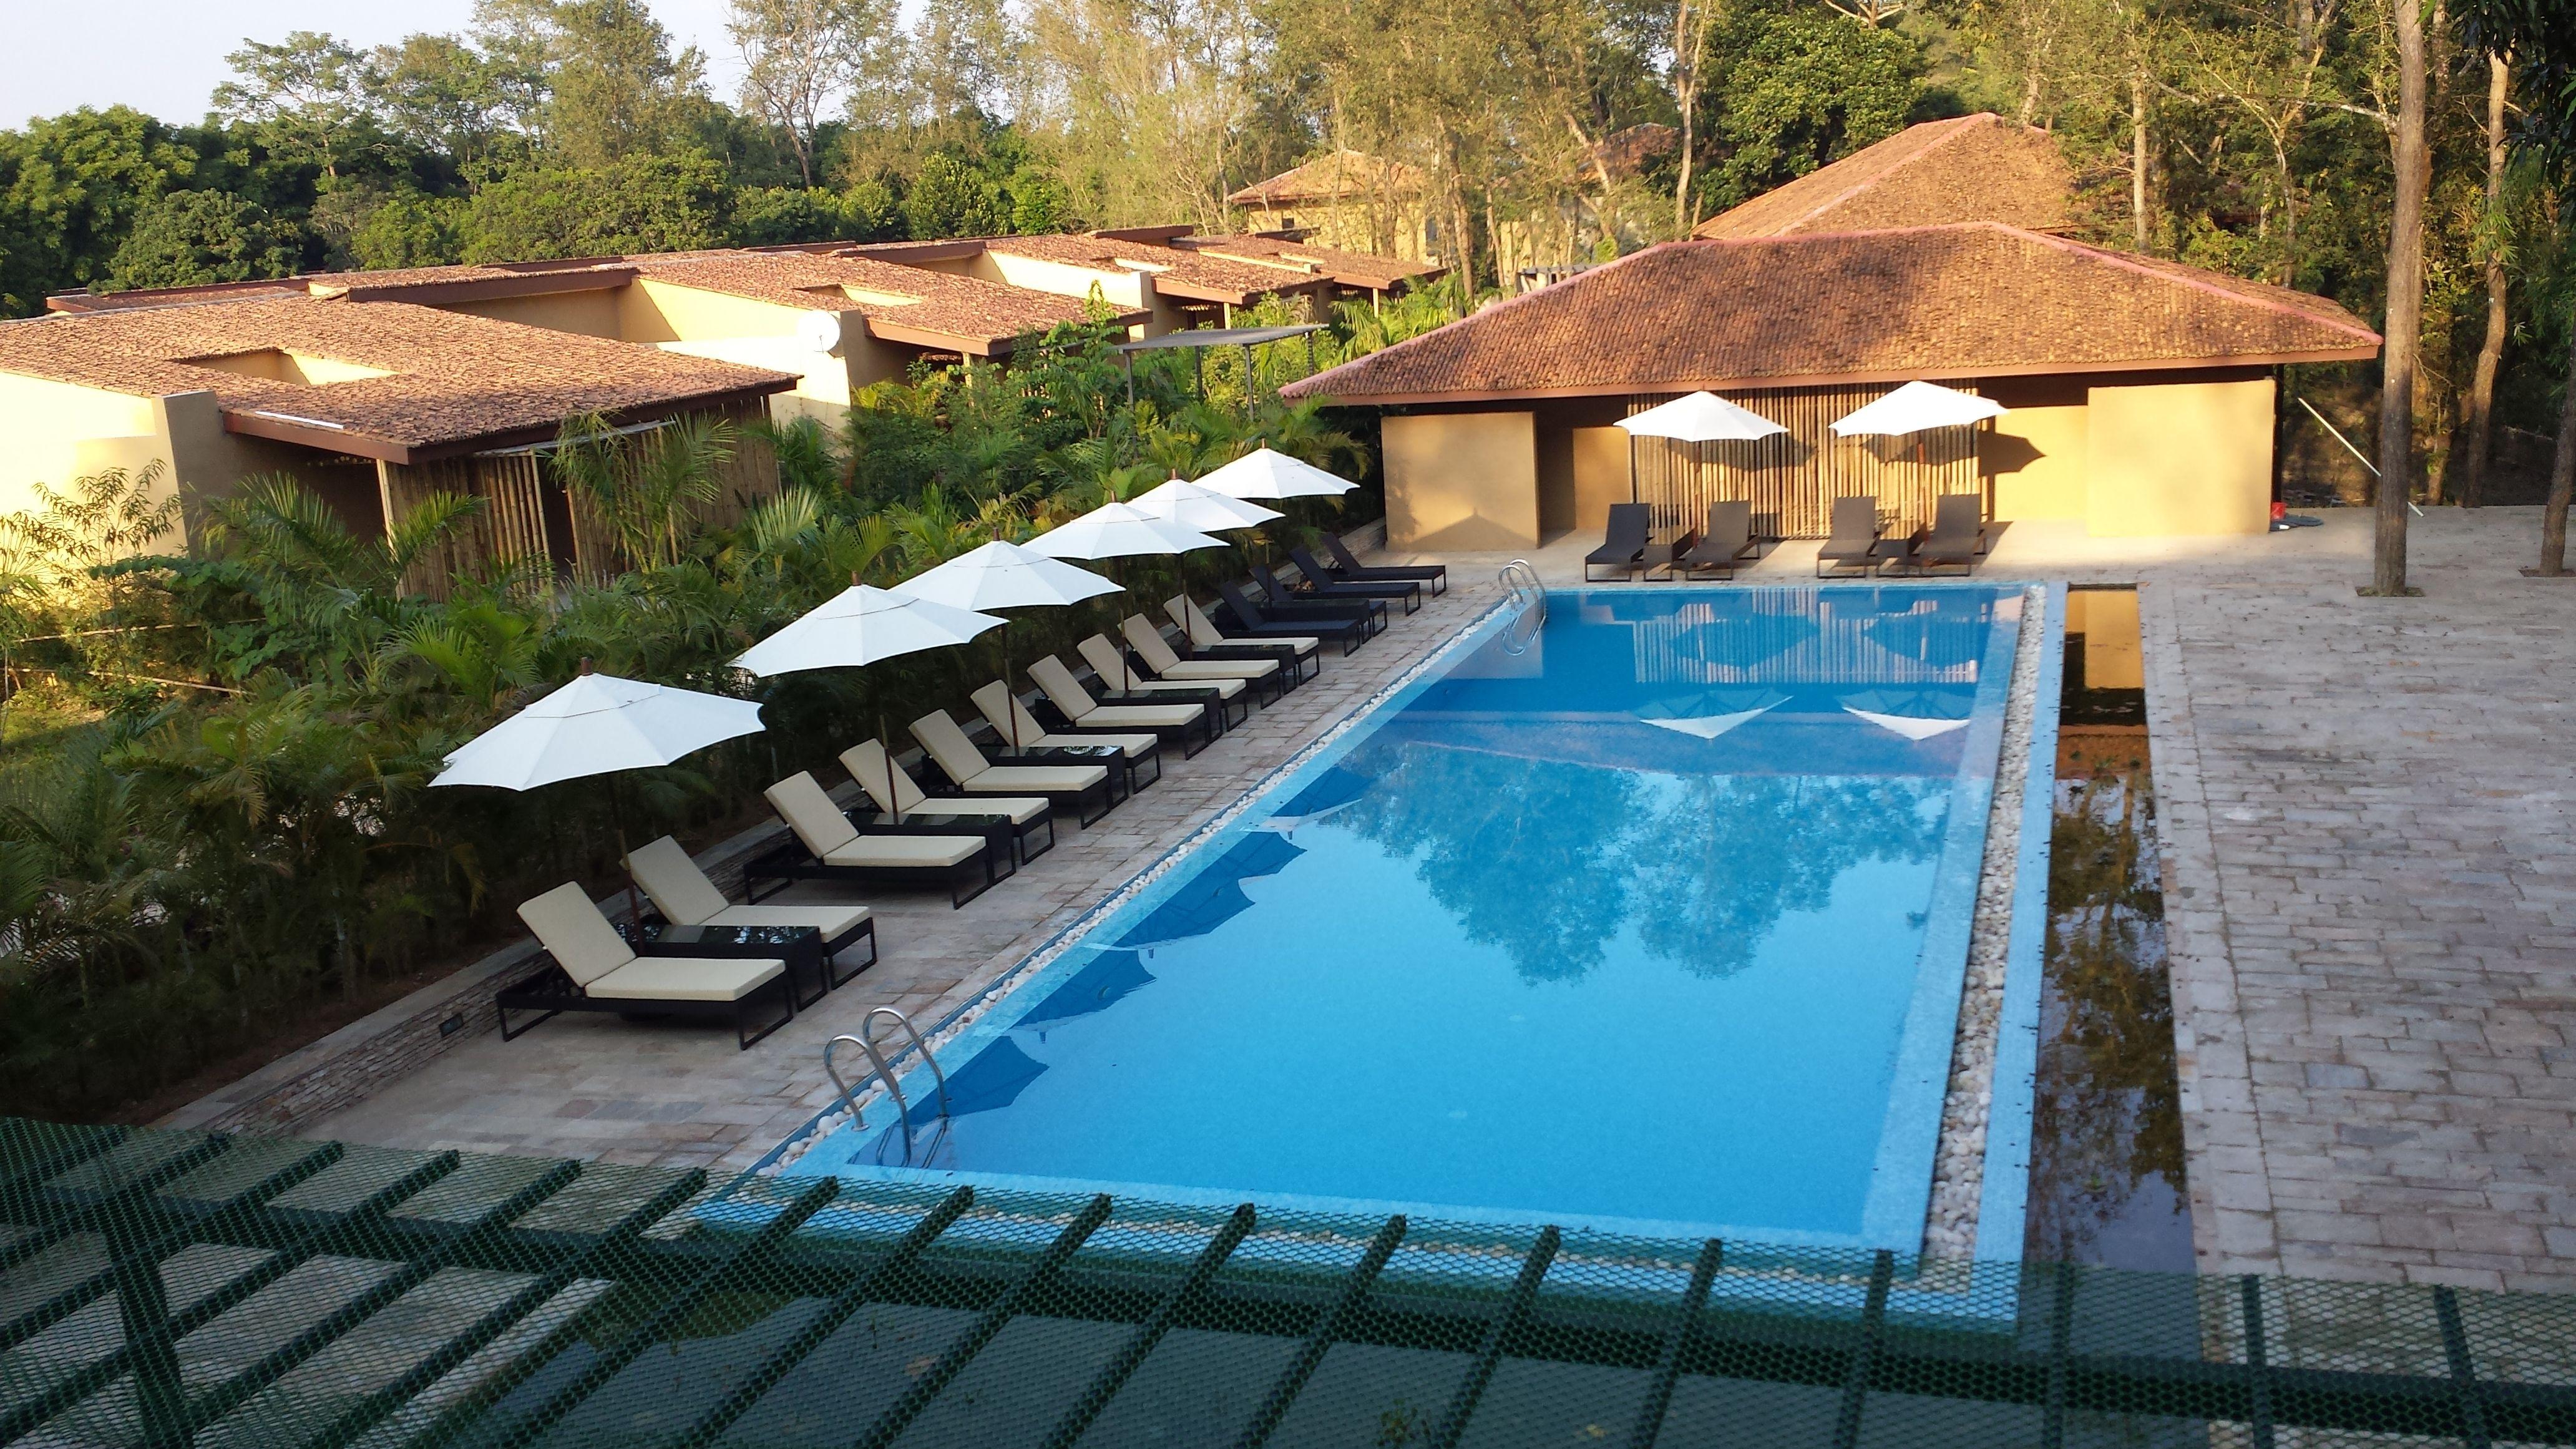 kasara jungle resort chitwan national park nepal